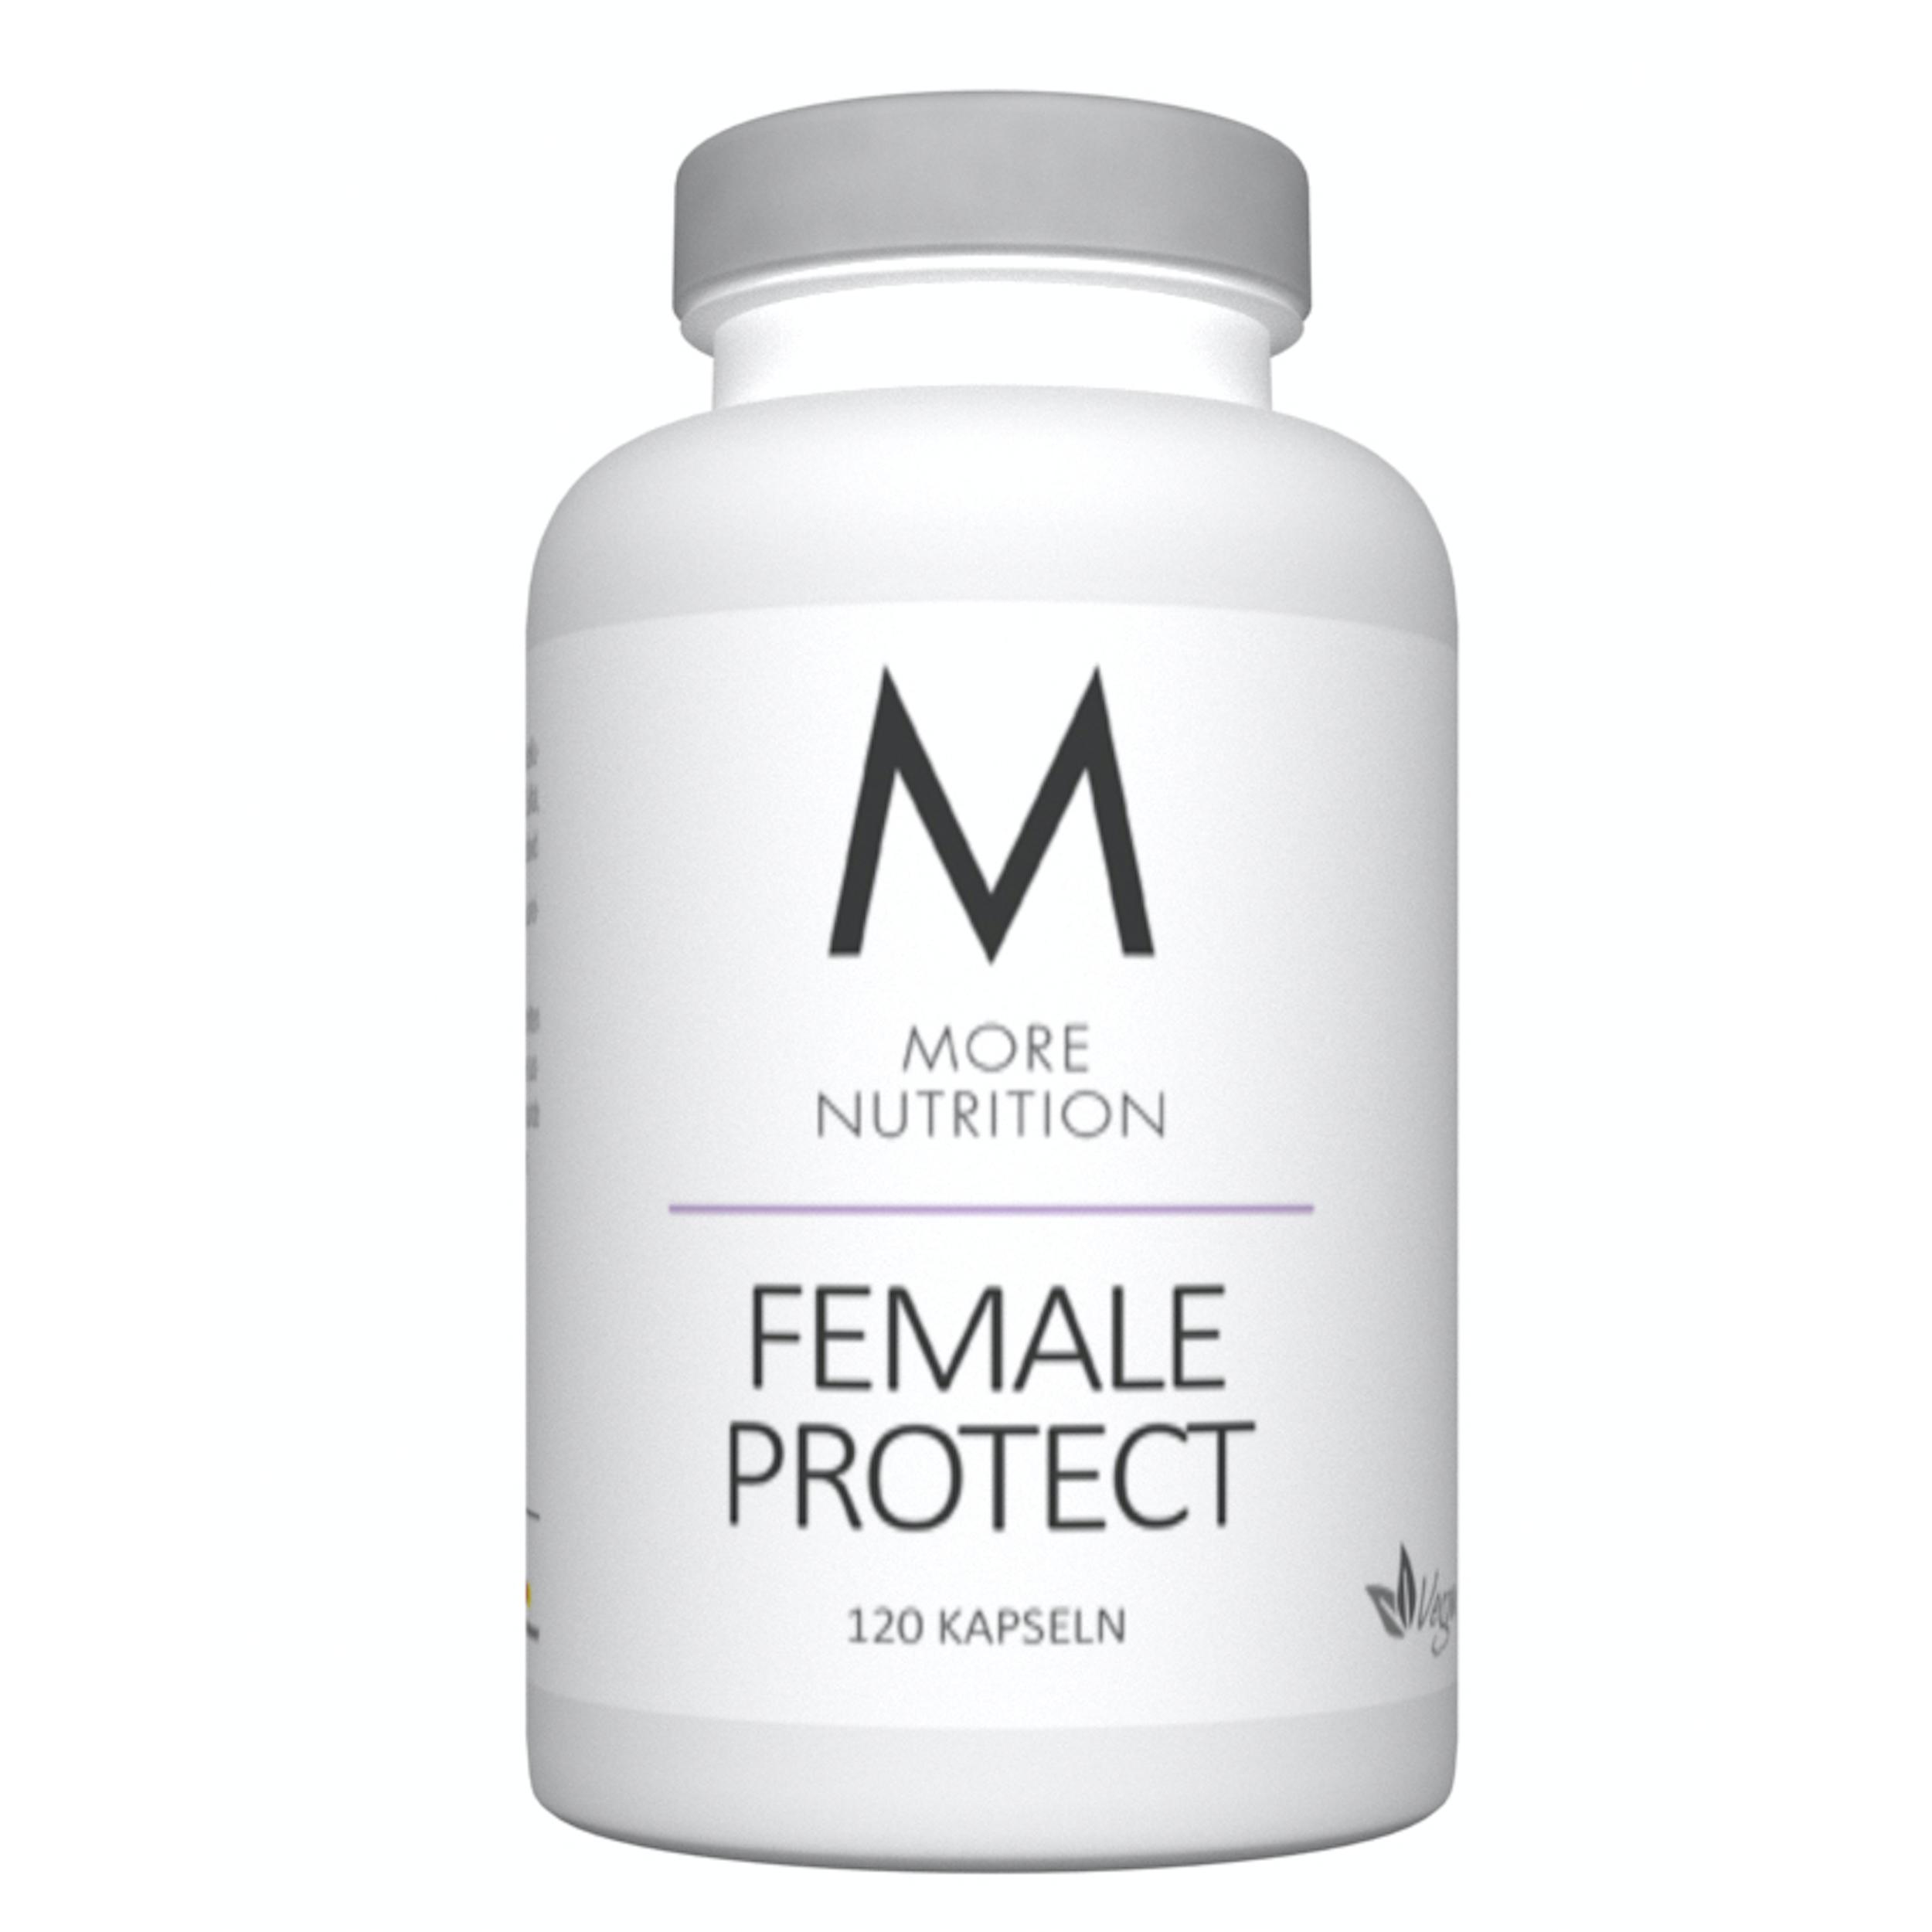 Female Protect